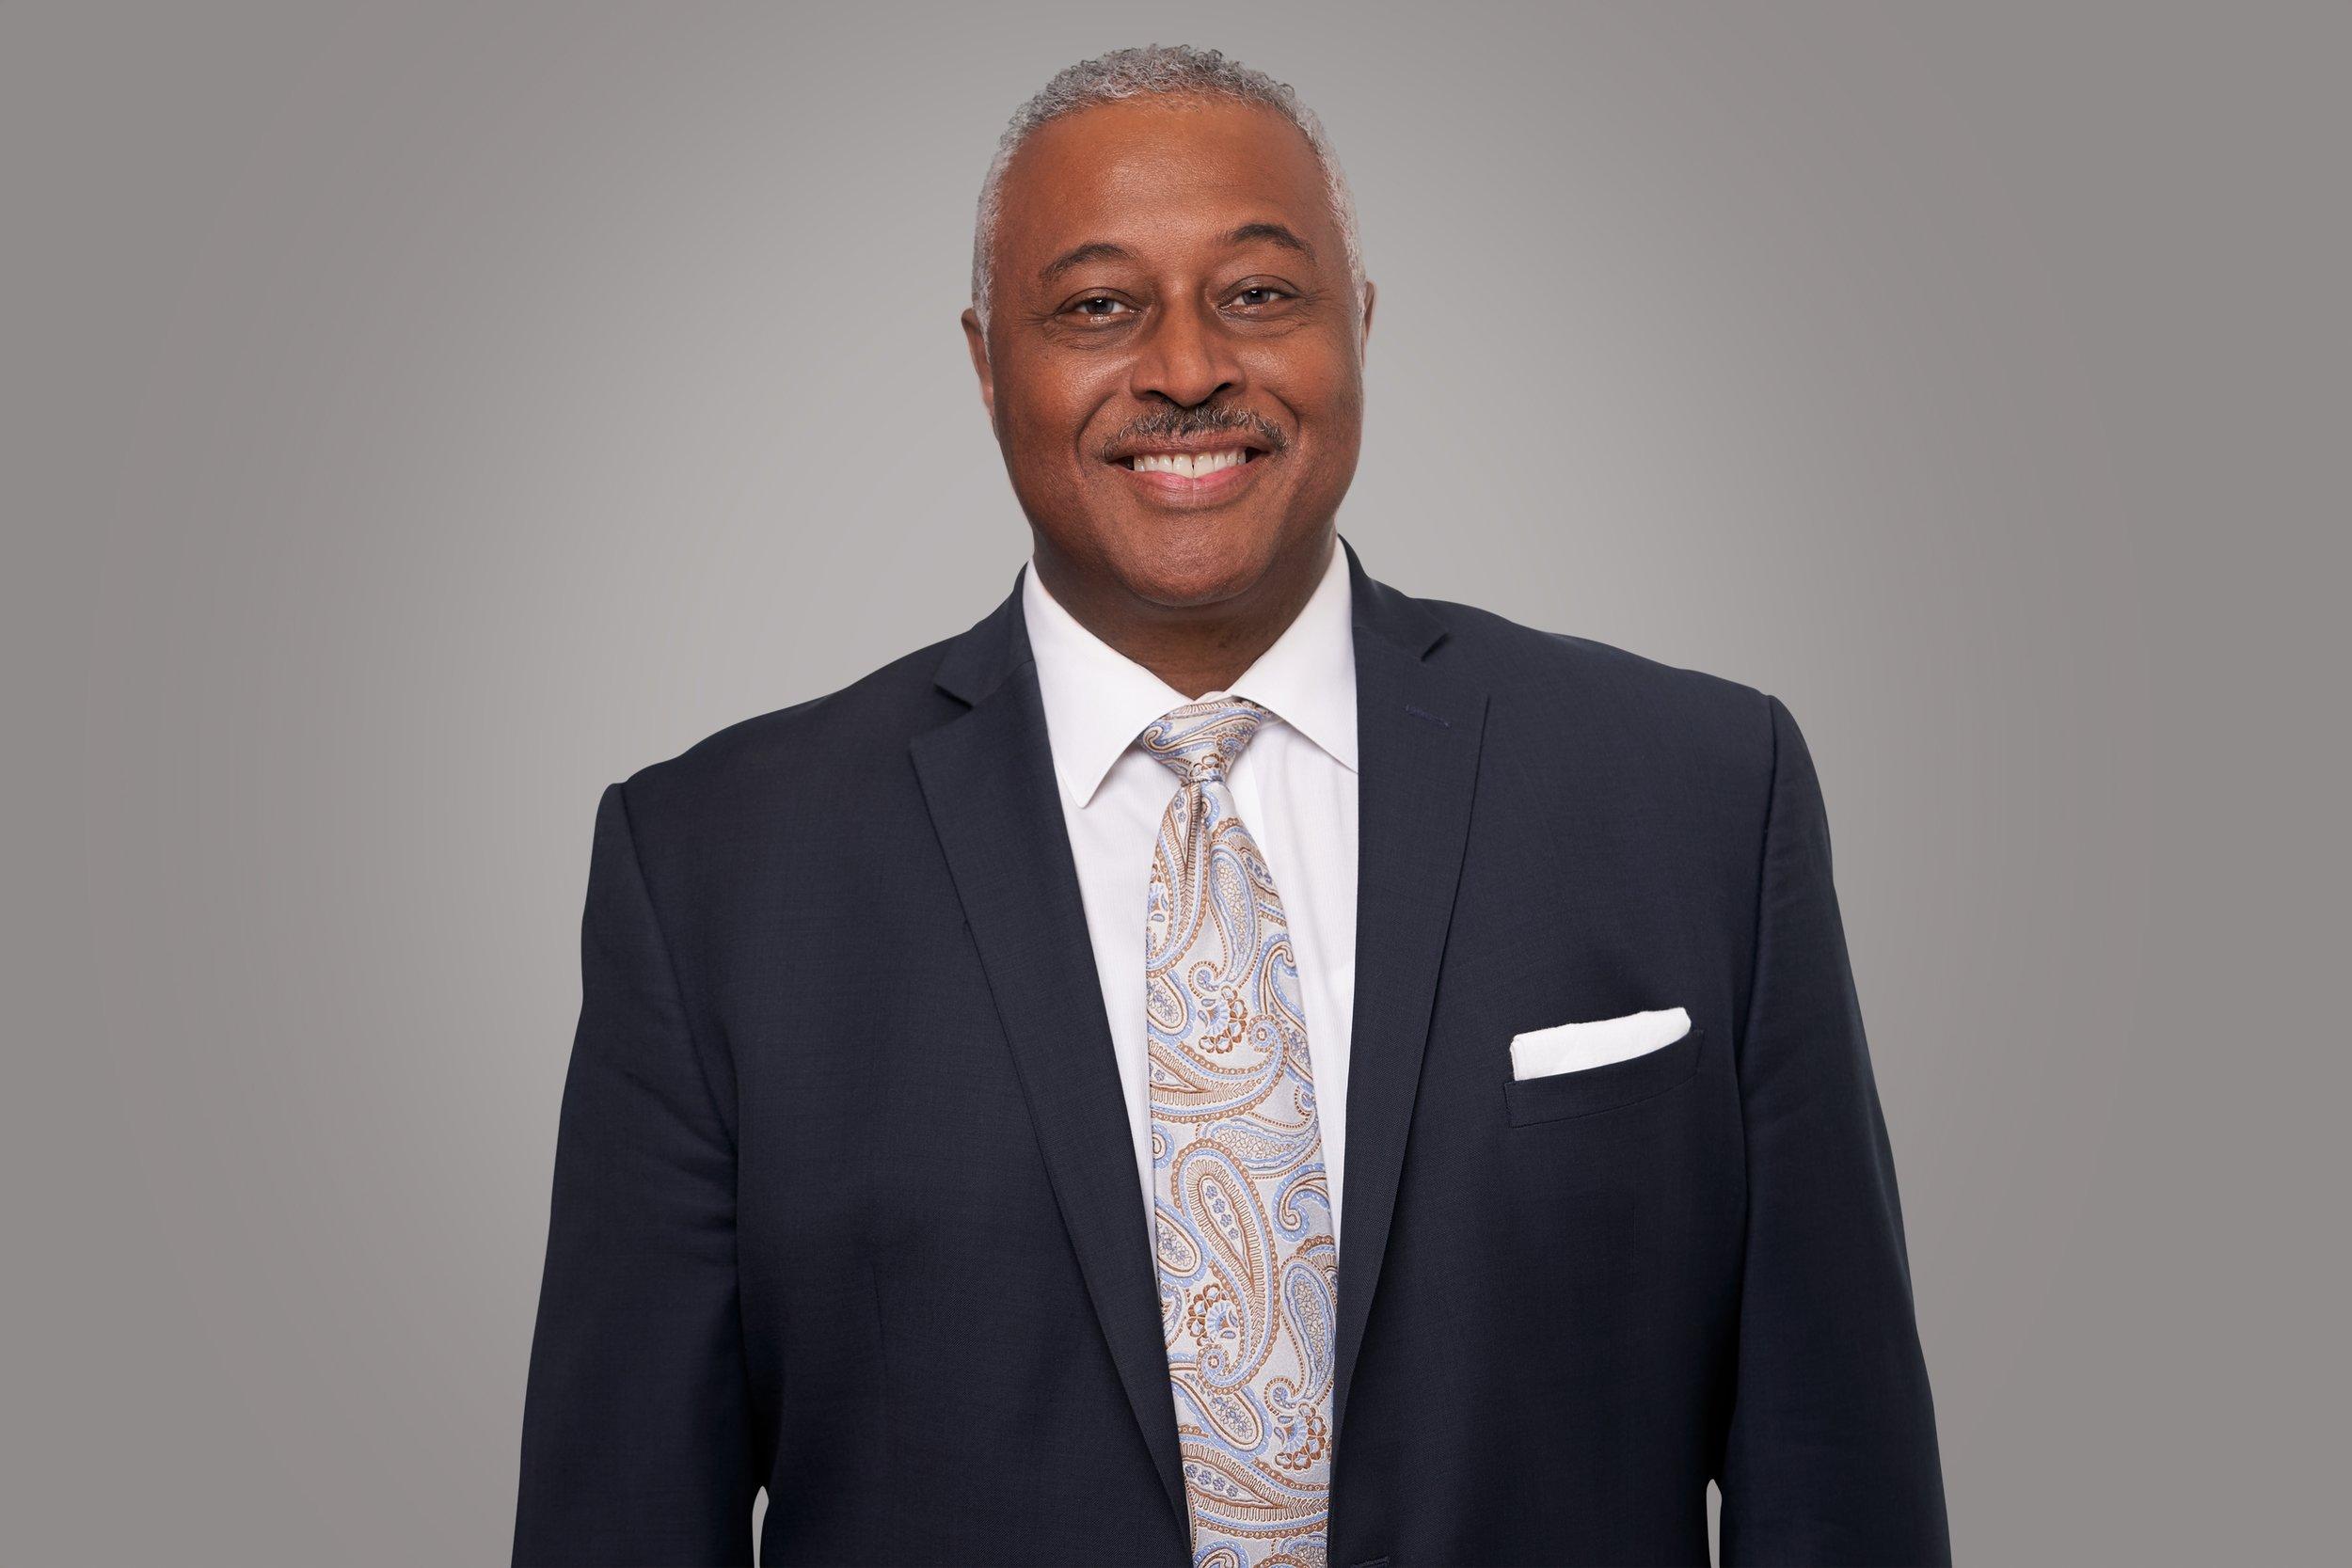 Reuben Blackwell (CEO)